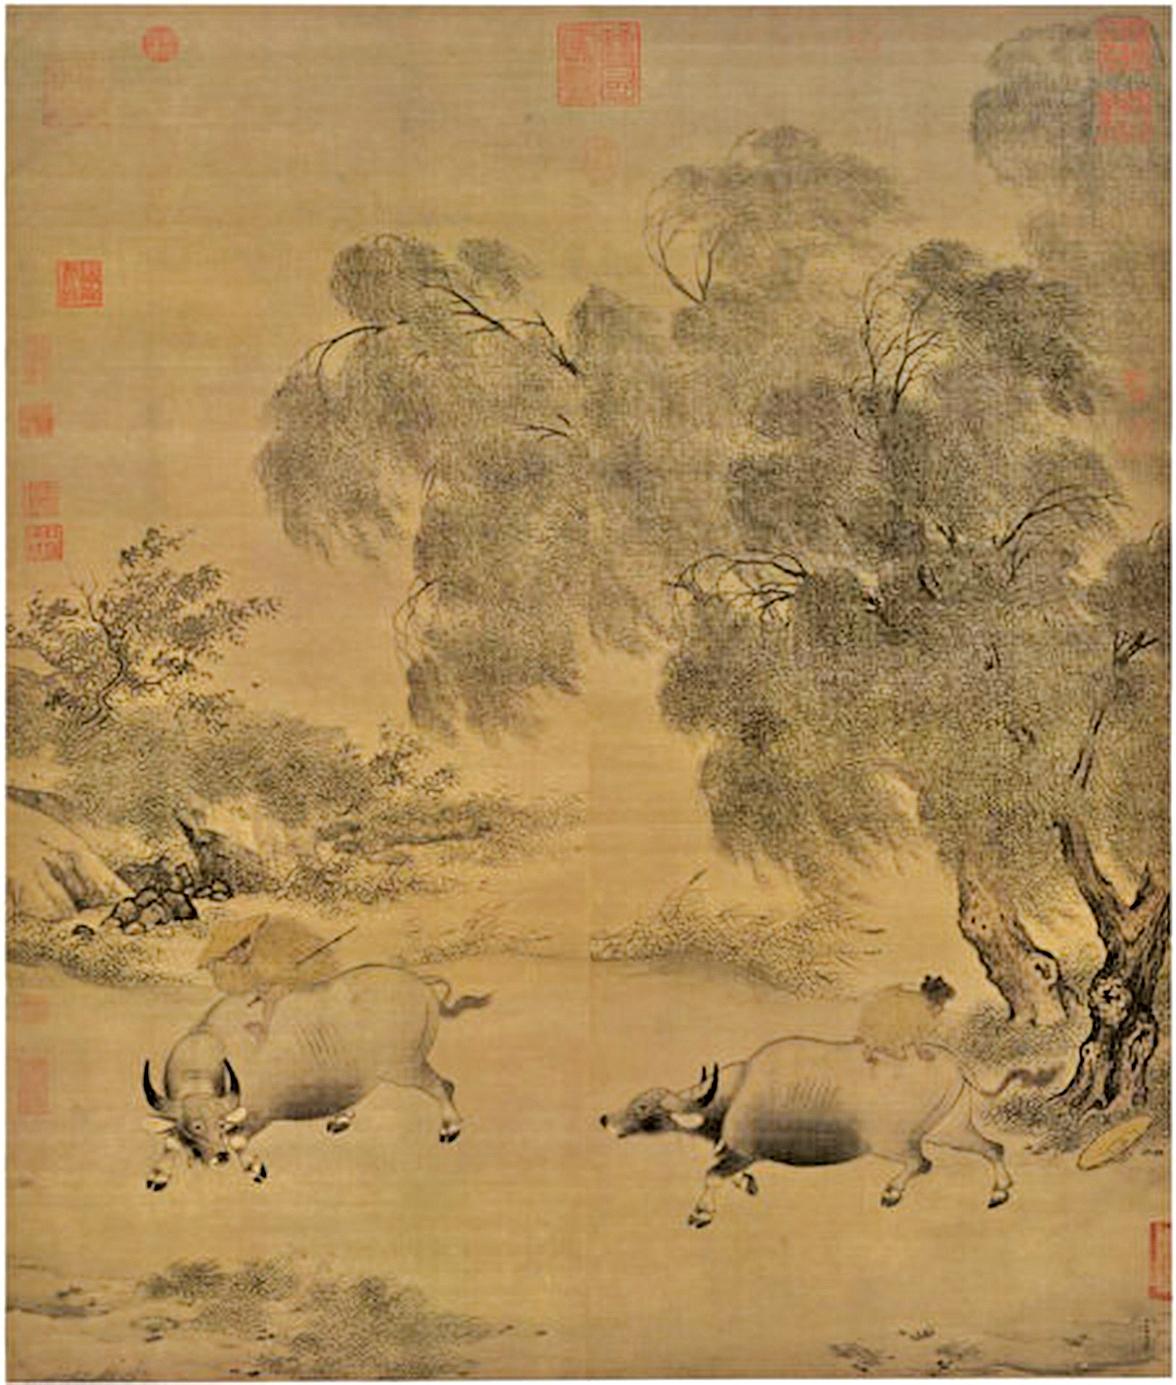 南宋李迪繪《風雨牧歸圖》(Ismoon/Wikimedia commons)